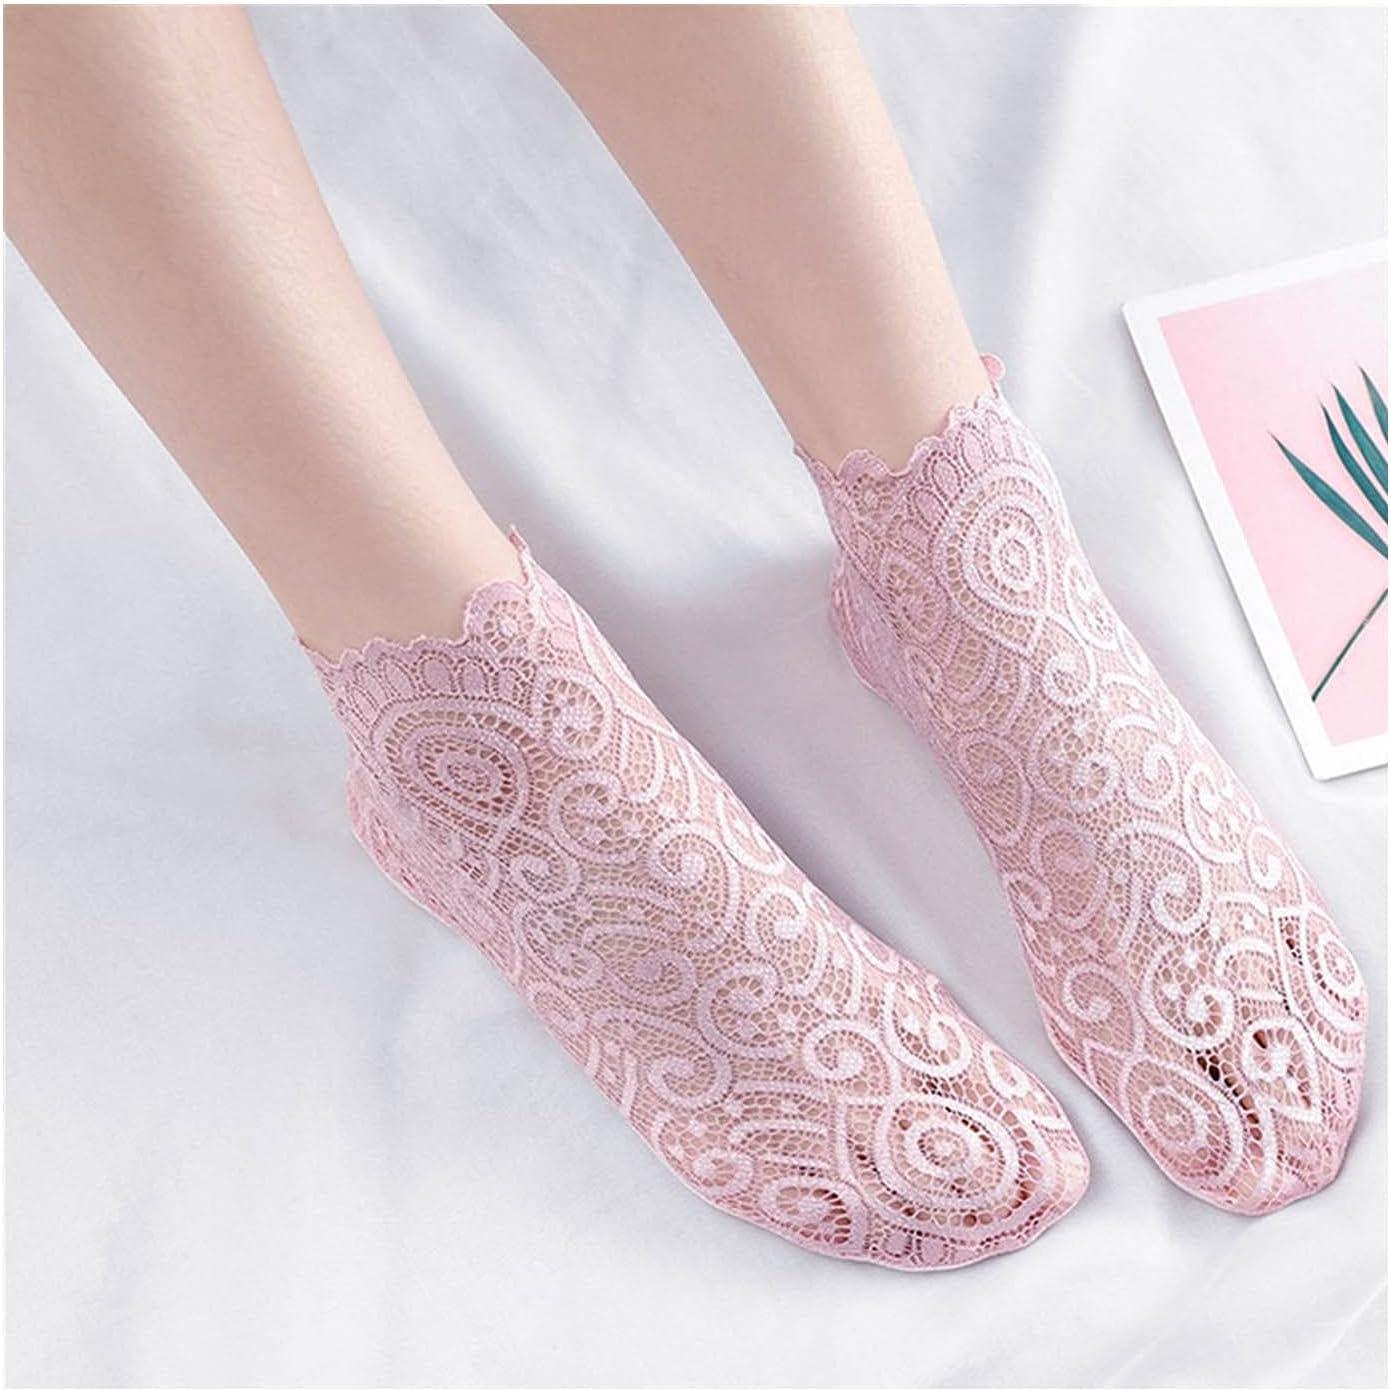 Moonlight Star Ladies' Floral Lace Socks Fashion Summer Mesh Short Hollow Chaussette Soft Cotton Bottom Non-Slip (Color : Style E)